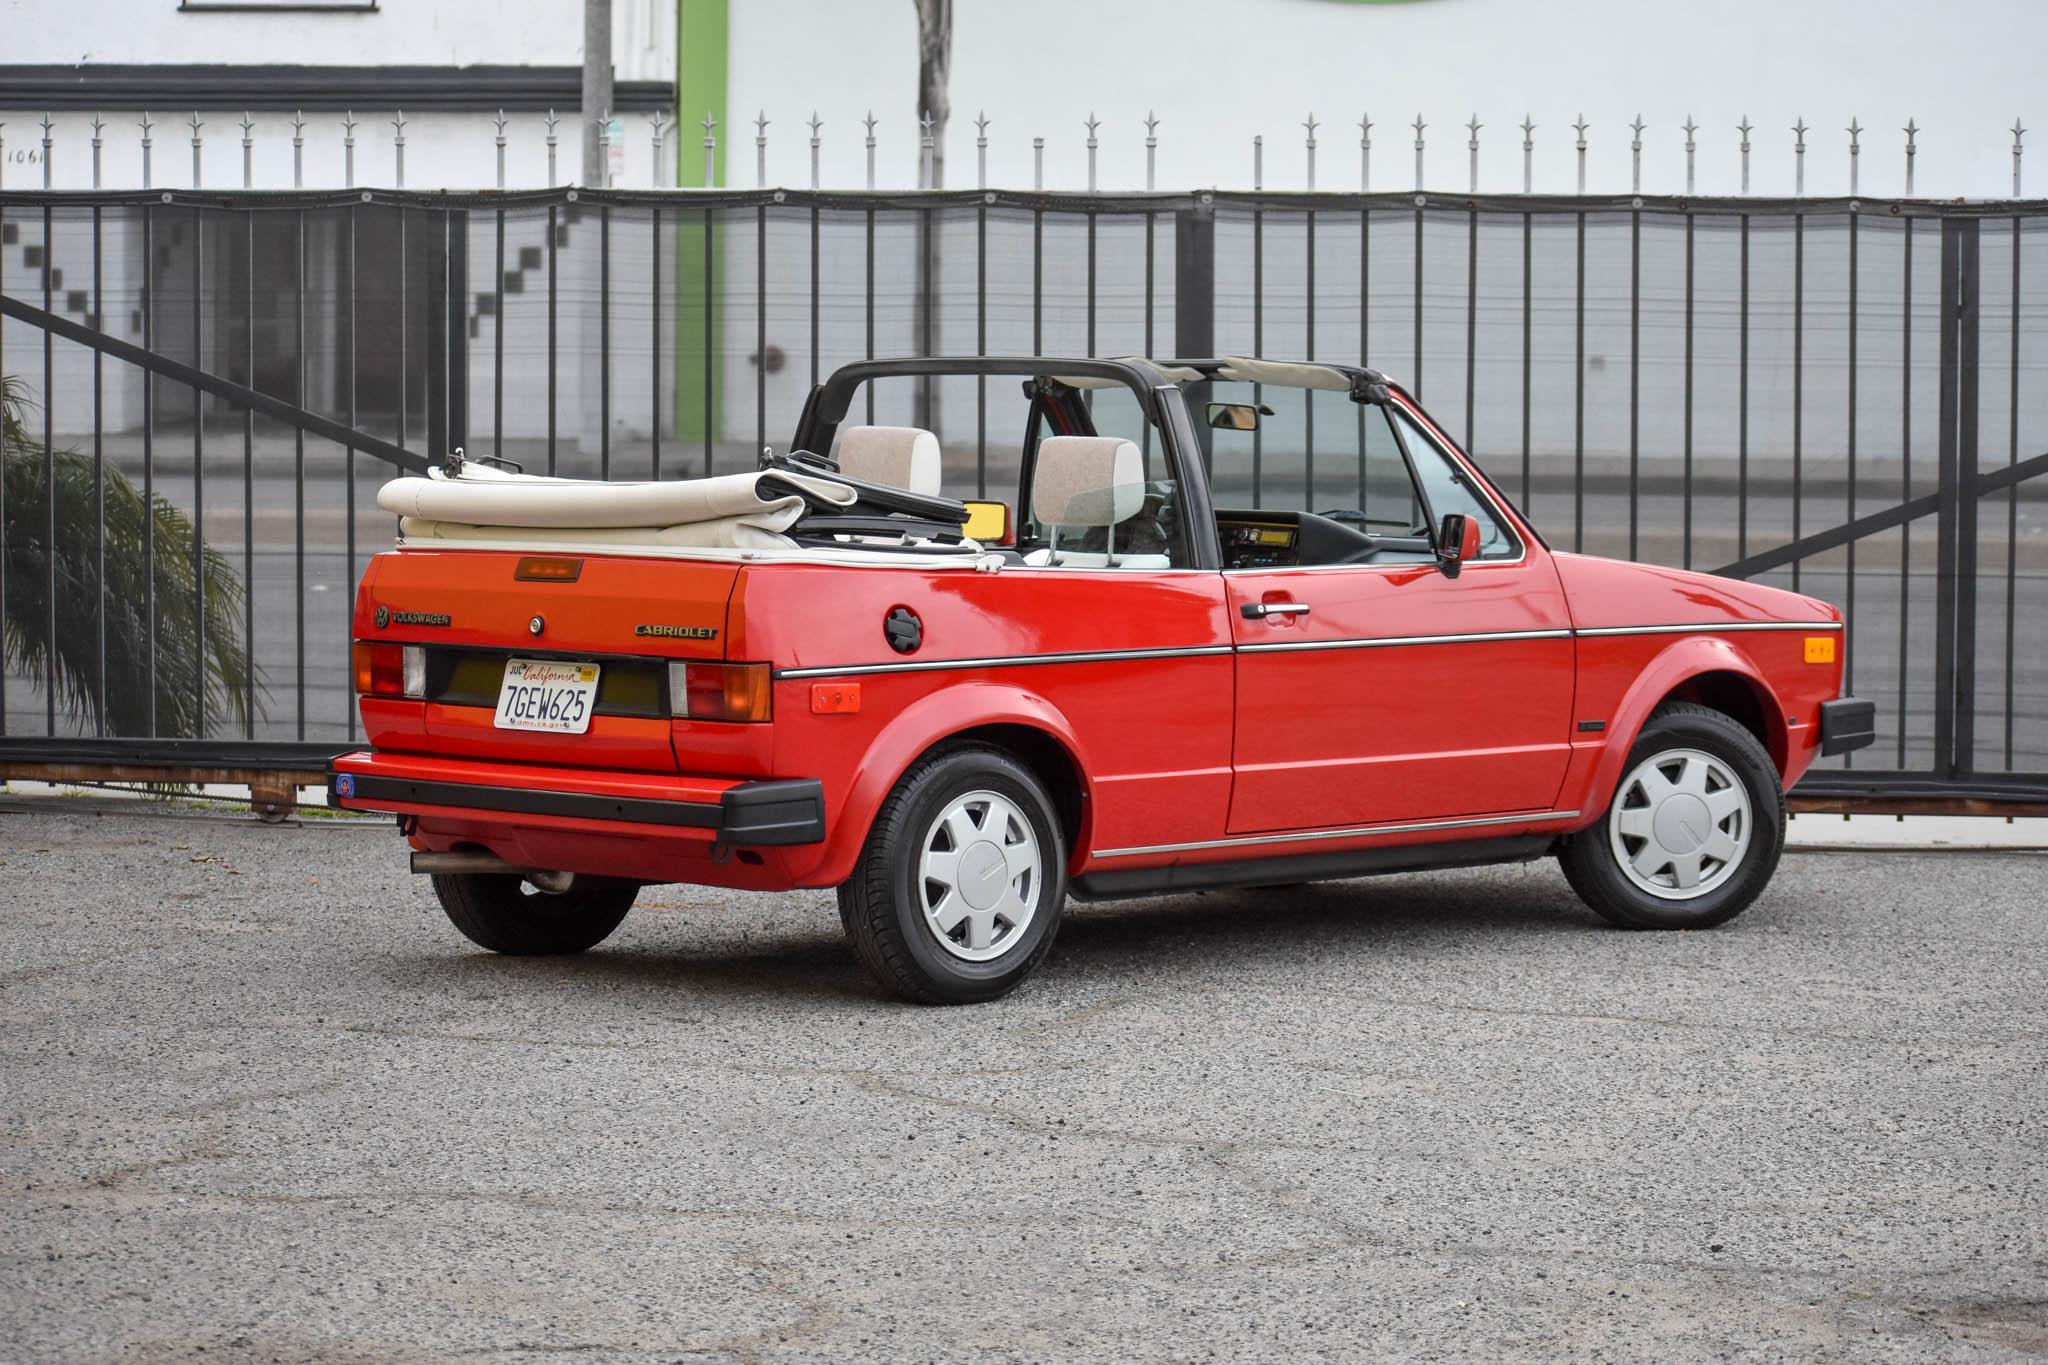 1987_volkswagen_cabriolet_158580913598764daDSC_0172